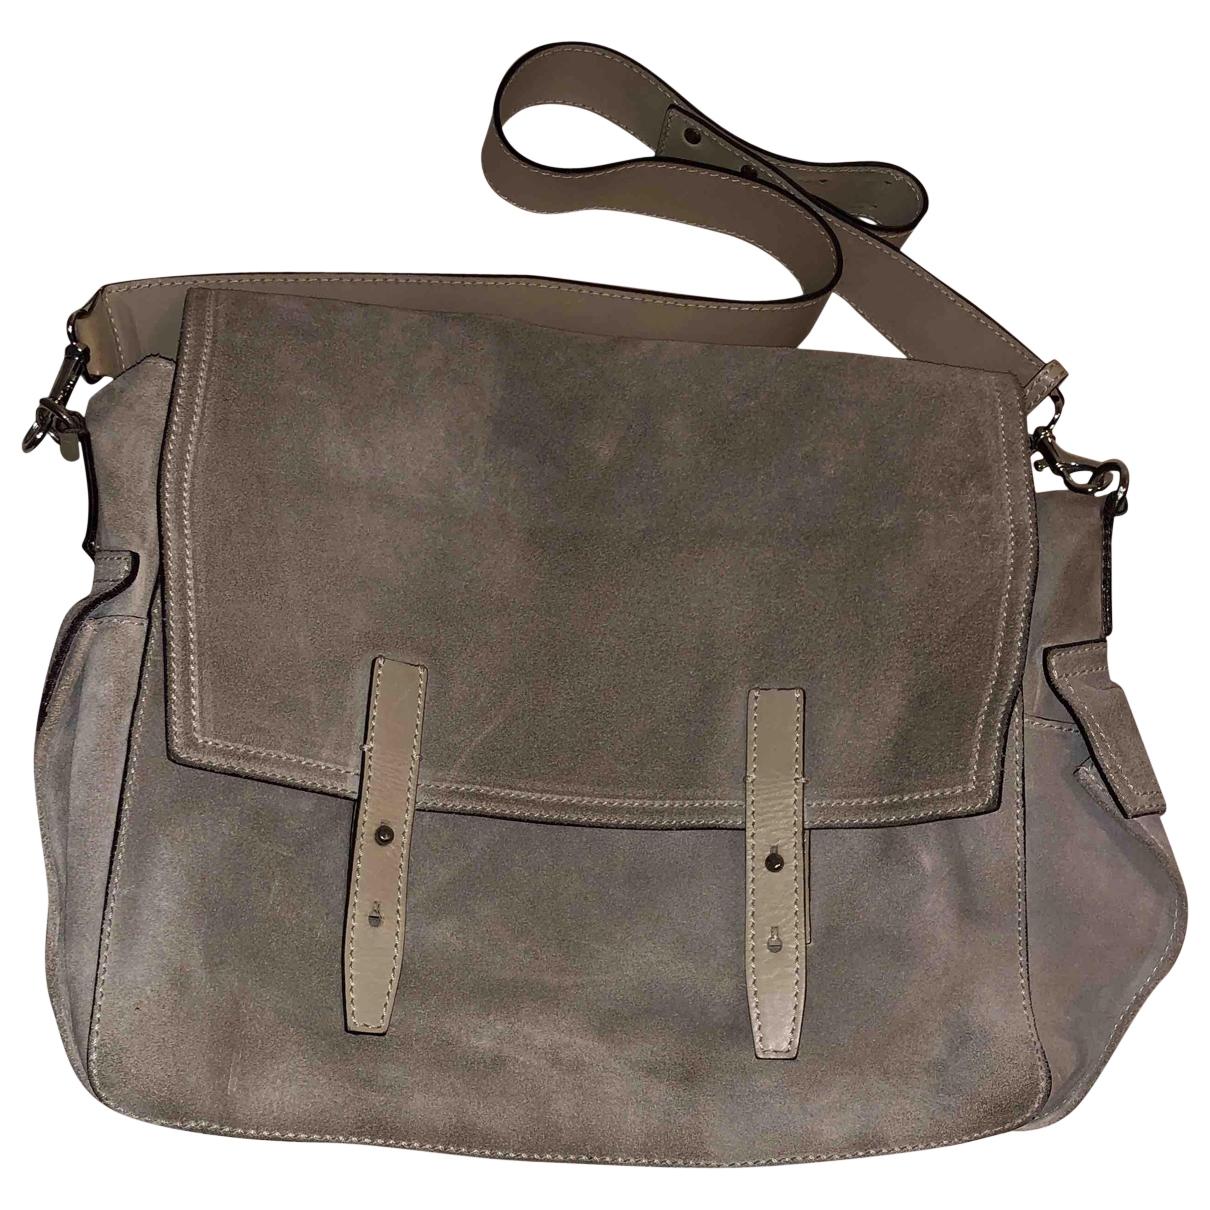 Max Mara \N Grey Suede handbag for Women \N